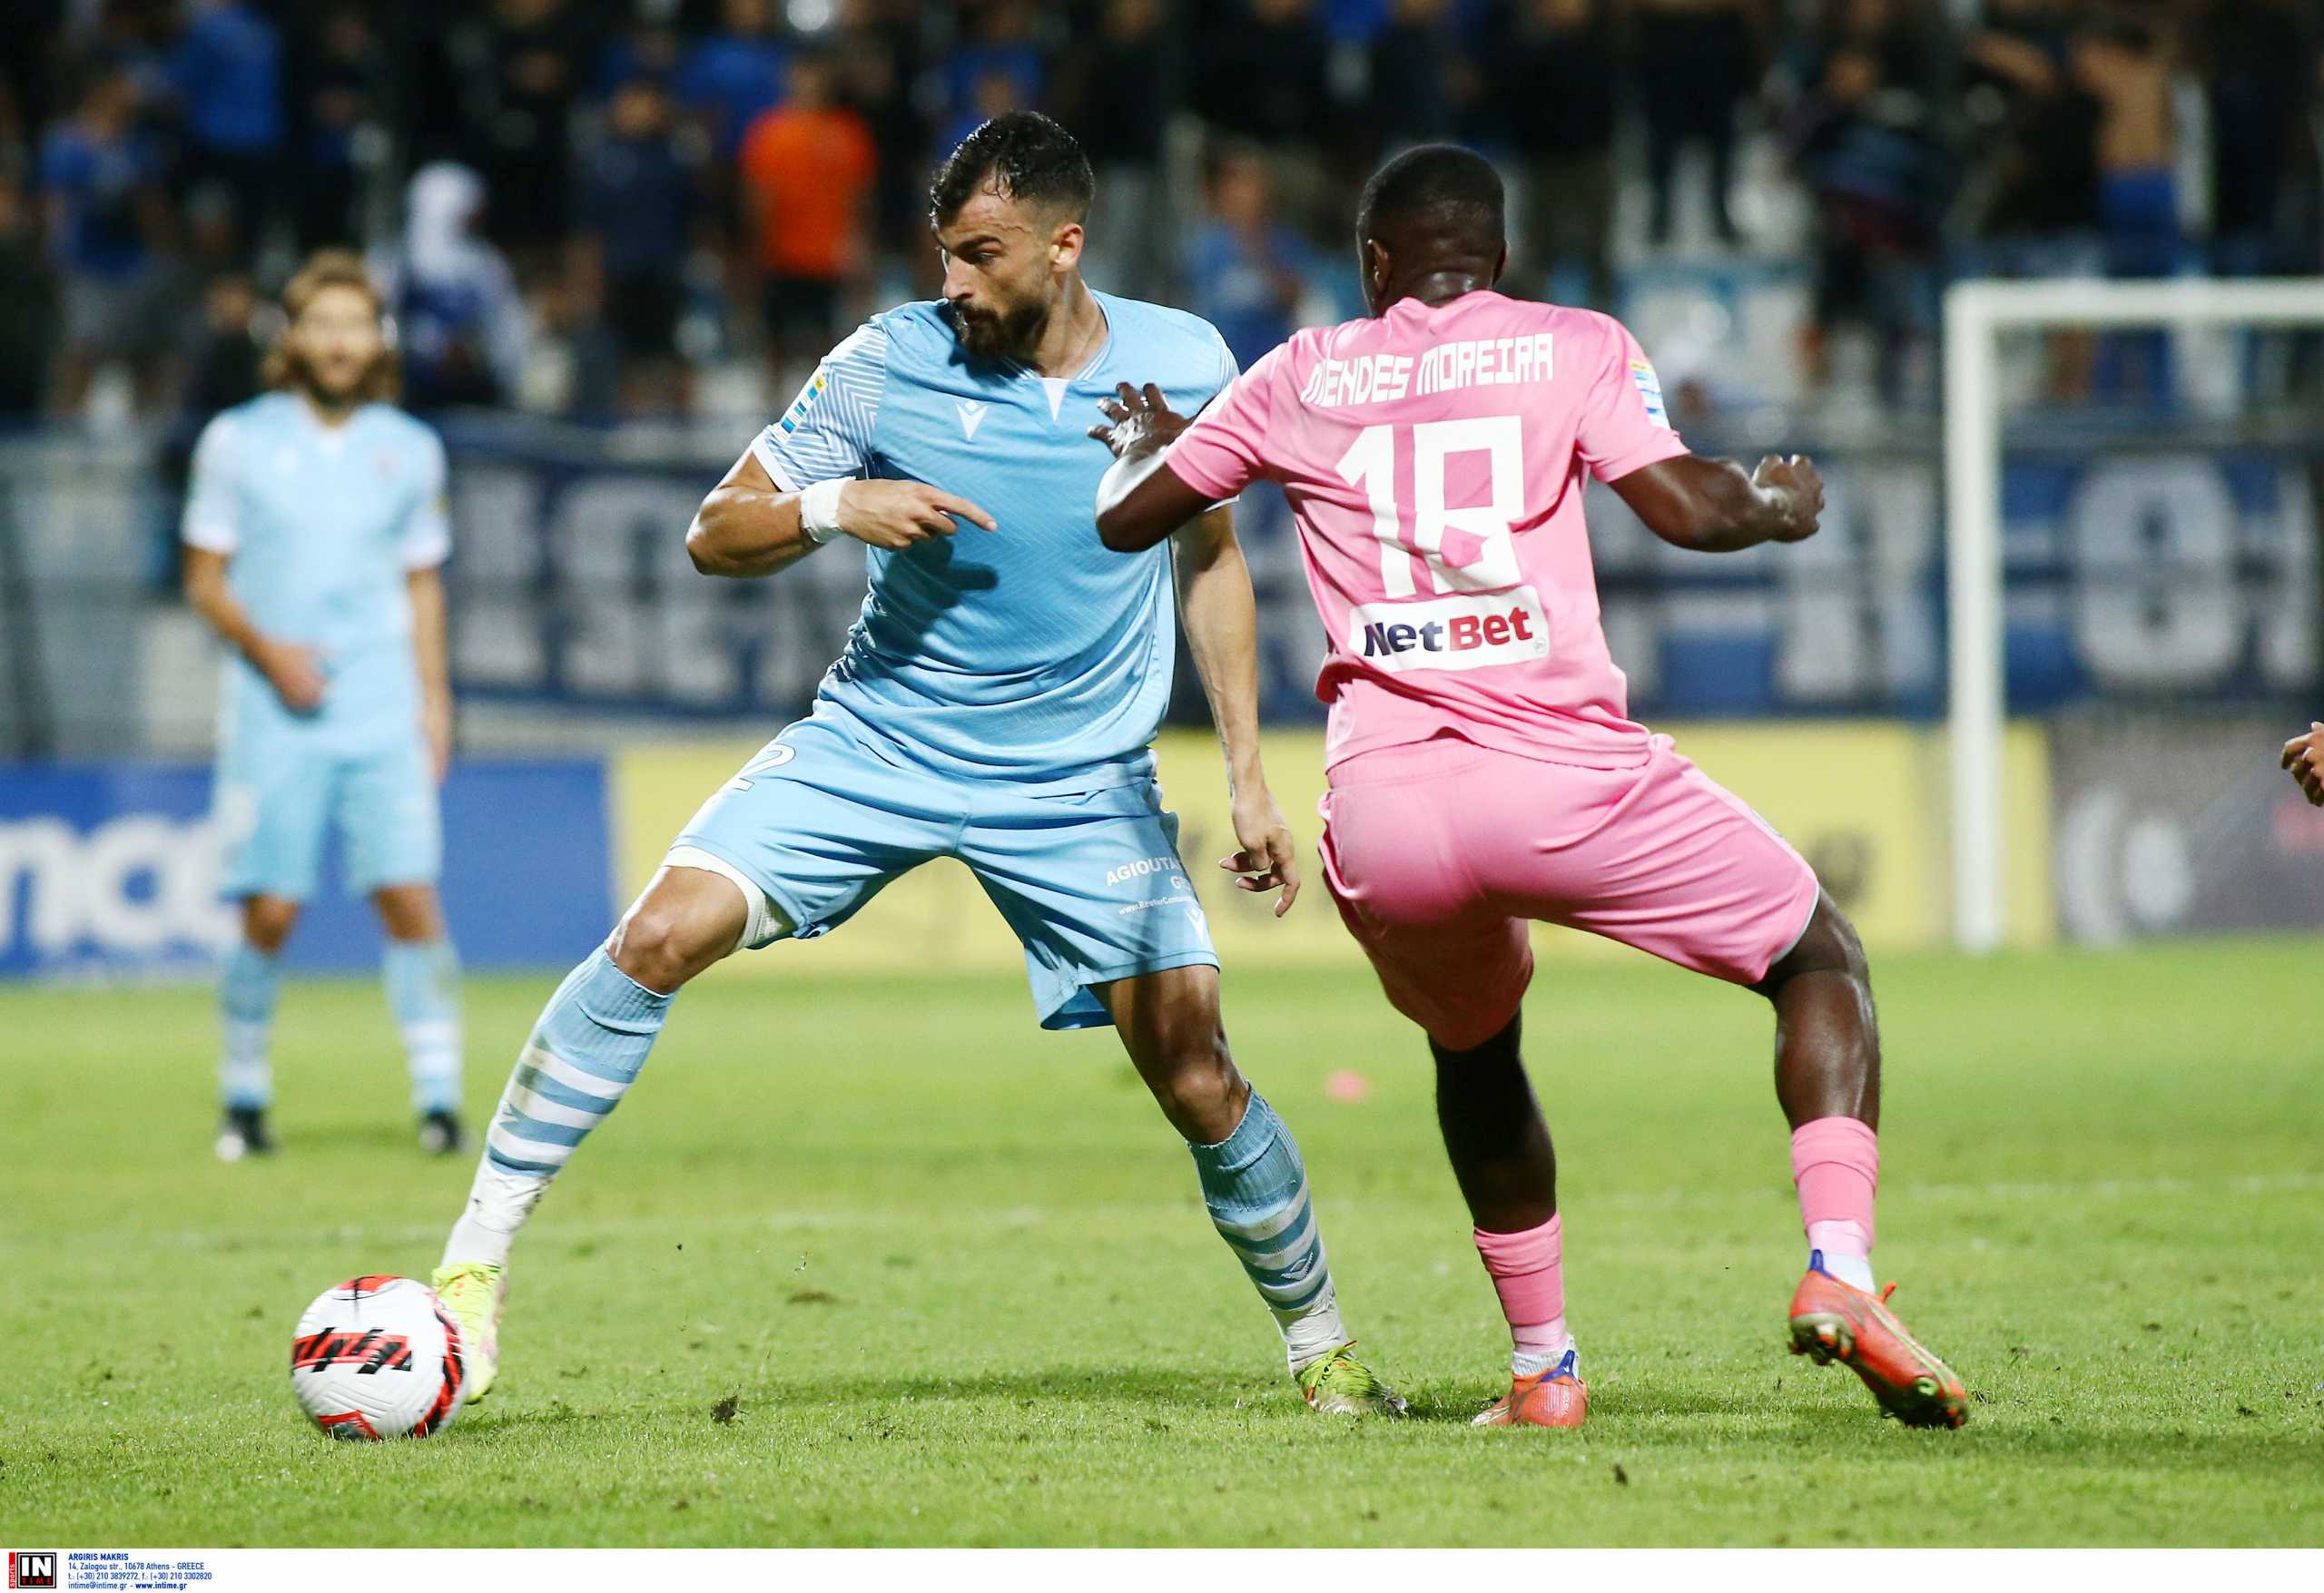 Superleague 1, Ιωνικός – ΠΑΣ Γιάννινα 0-0: Νίκησαν οι άμυνες στη Νίκαια